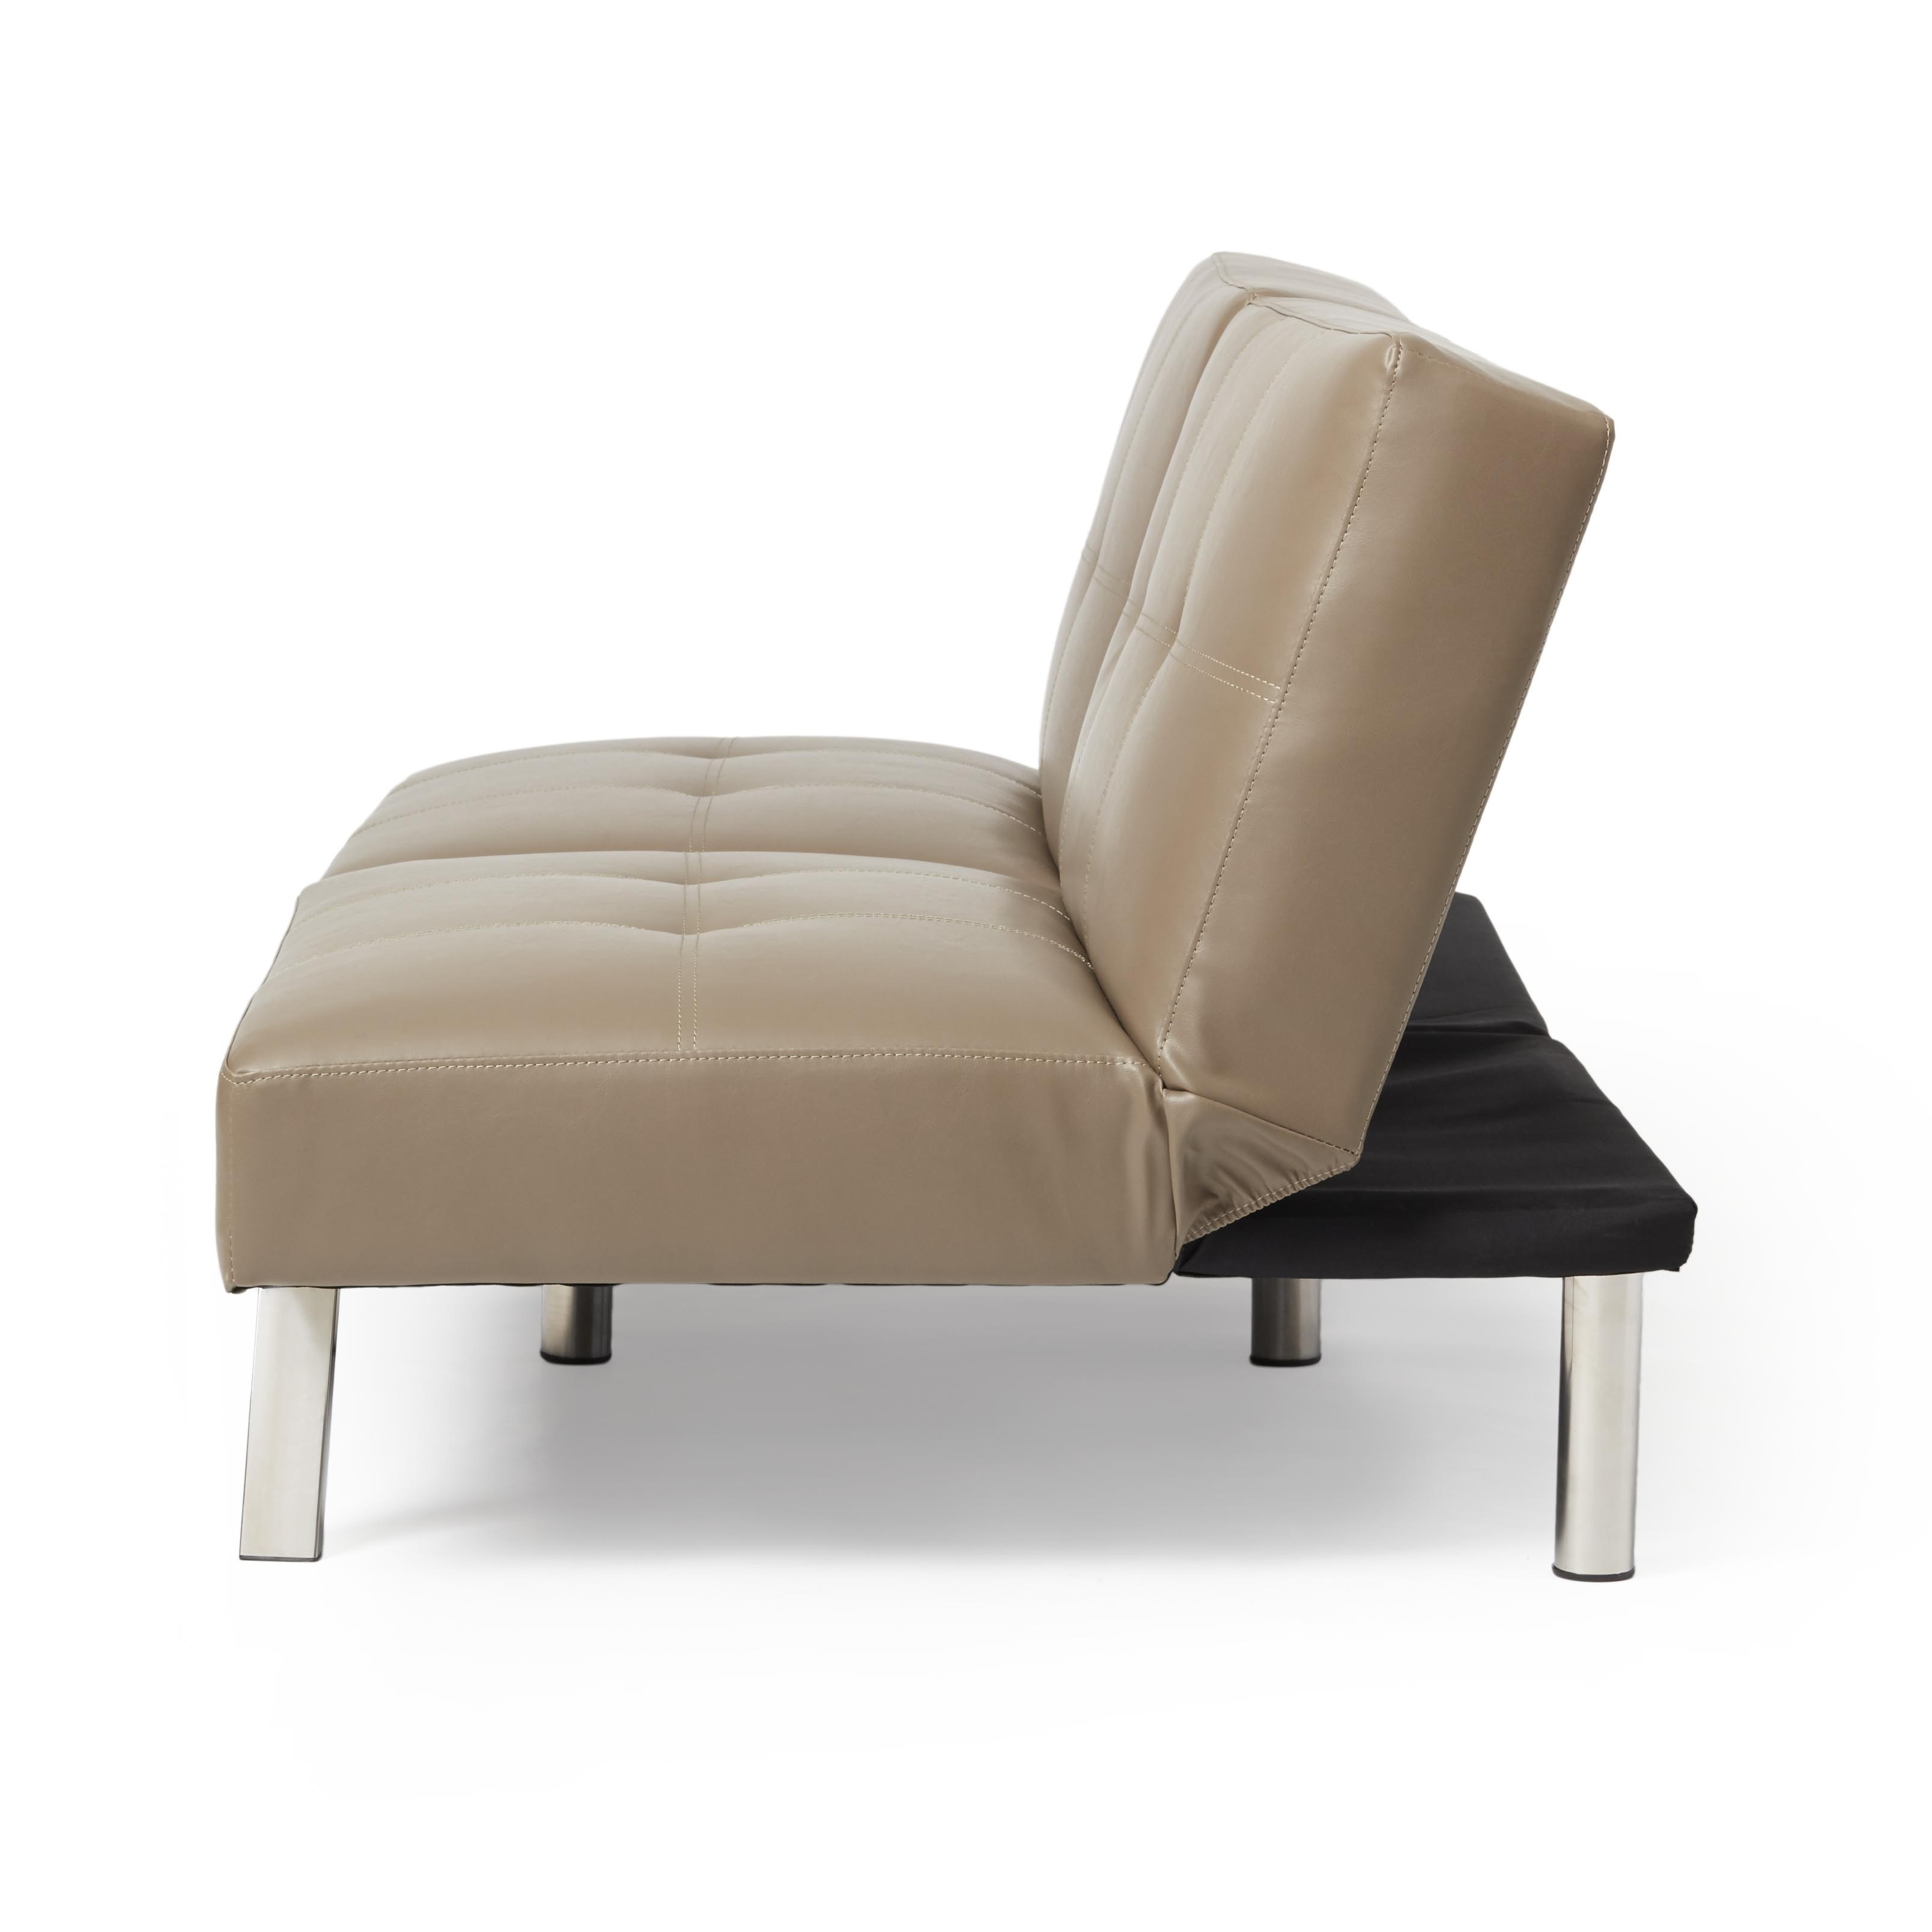 Abbyson Aspen Taupe Bonded Leather Foldable Futon Sleeper Sofa